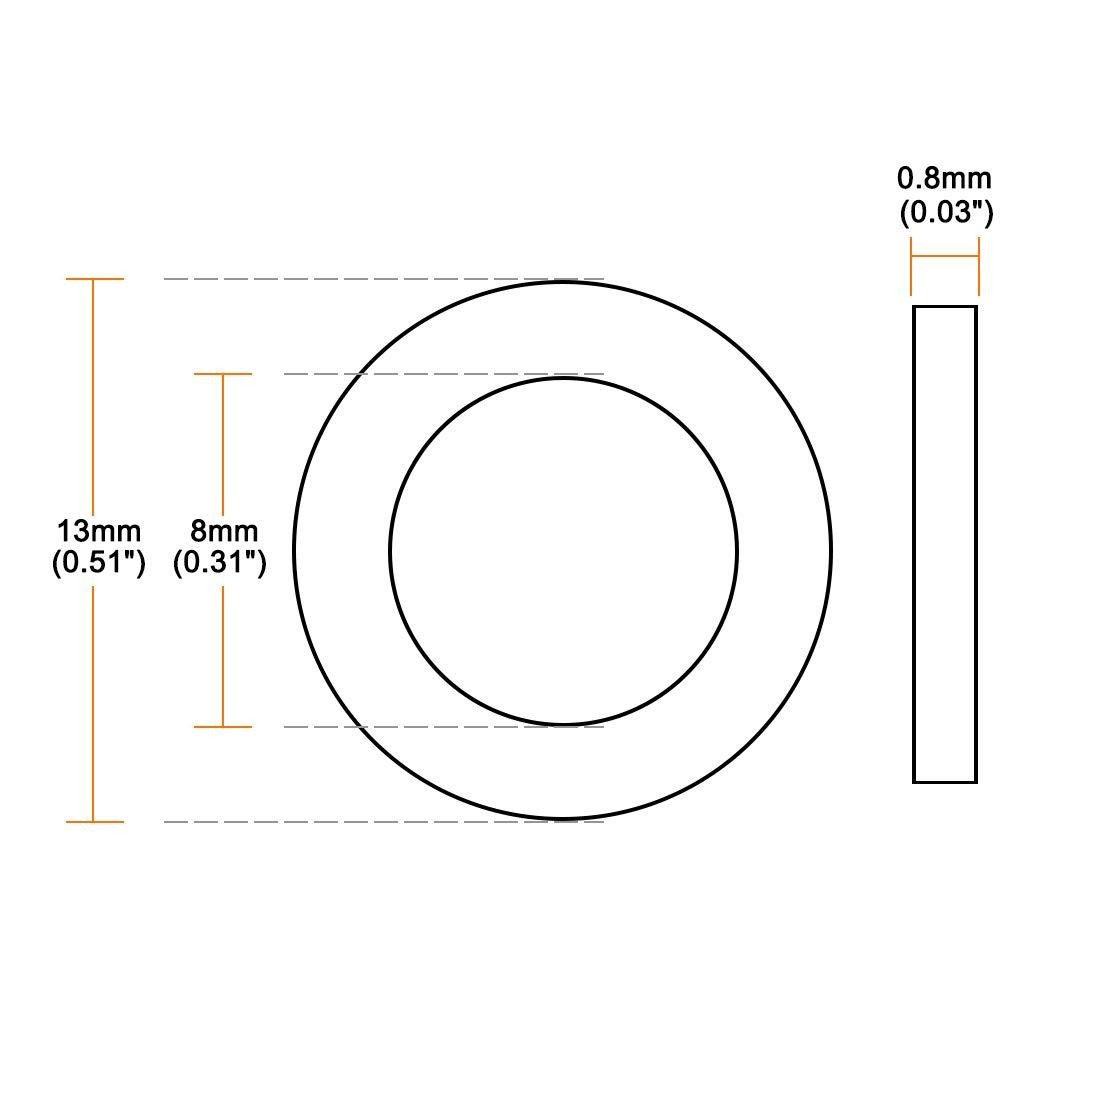 sourcing map arandelas planas de nylon para tornillo m6 tornillo 13mm od 1mm espesor claro 200pcs